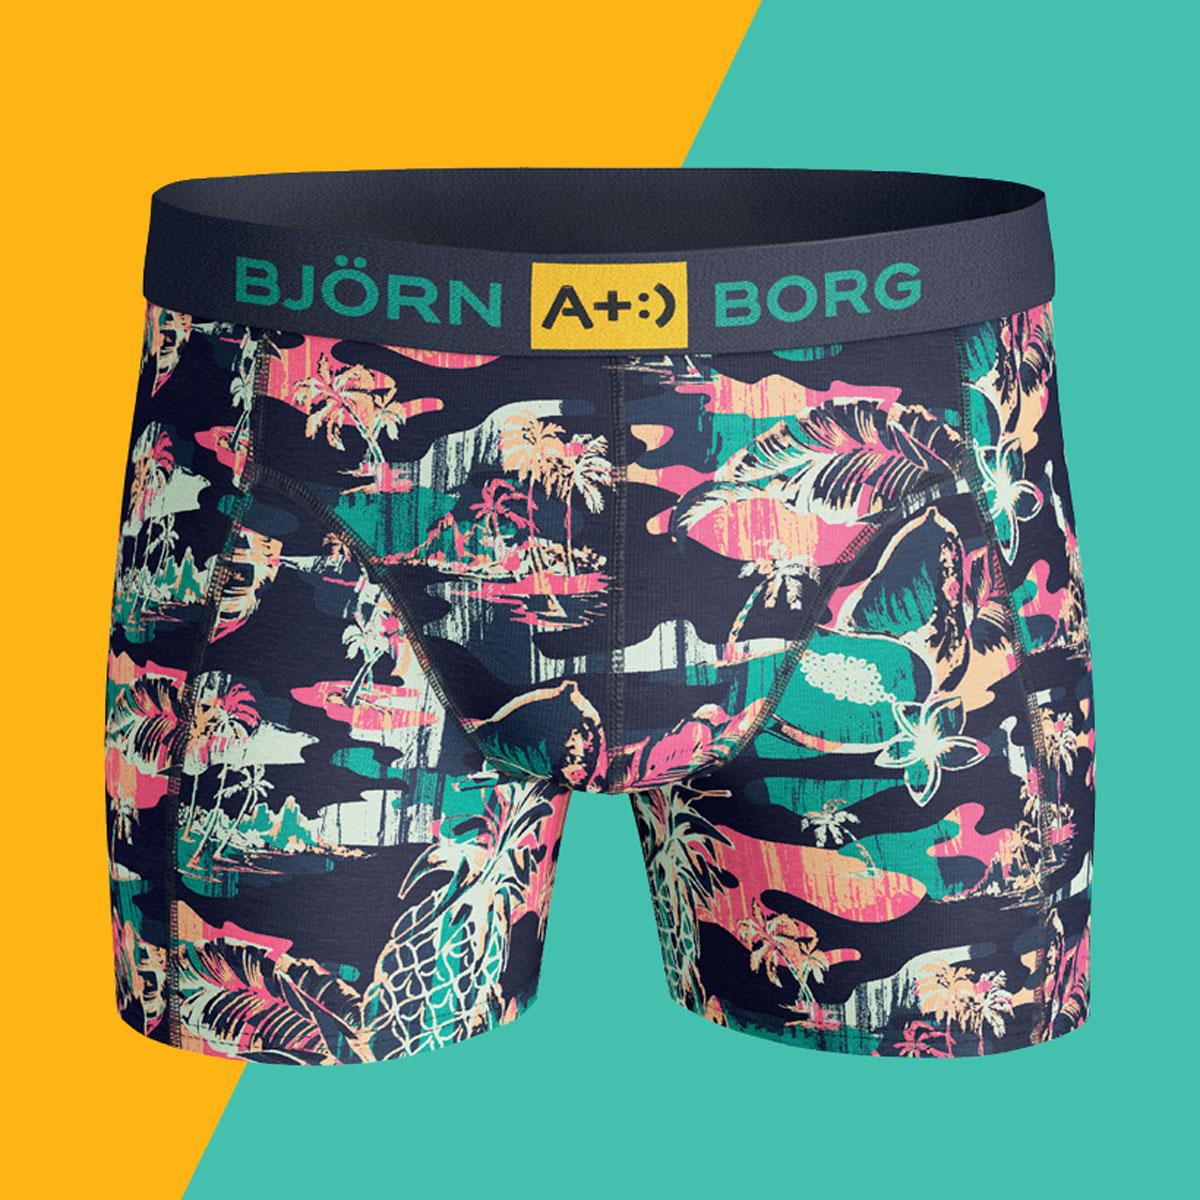 477e90f2f2b Hampakalsonger - Björn A+:) Borg